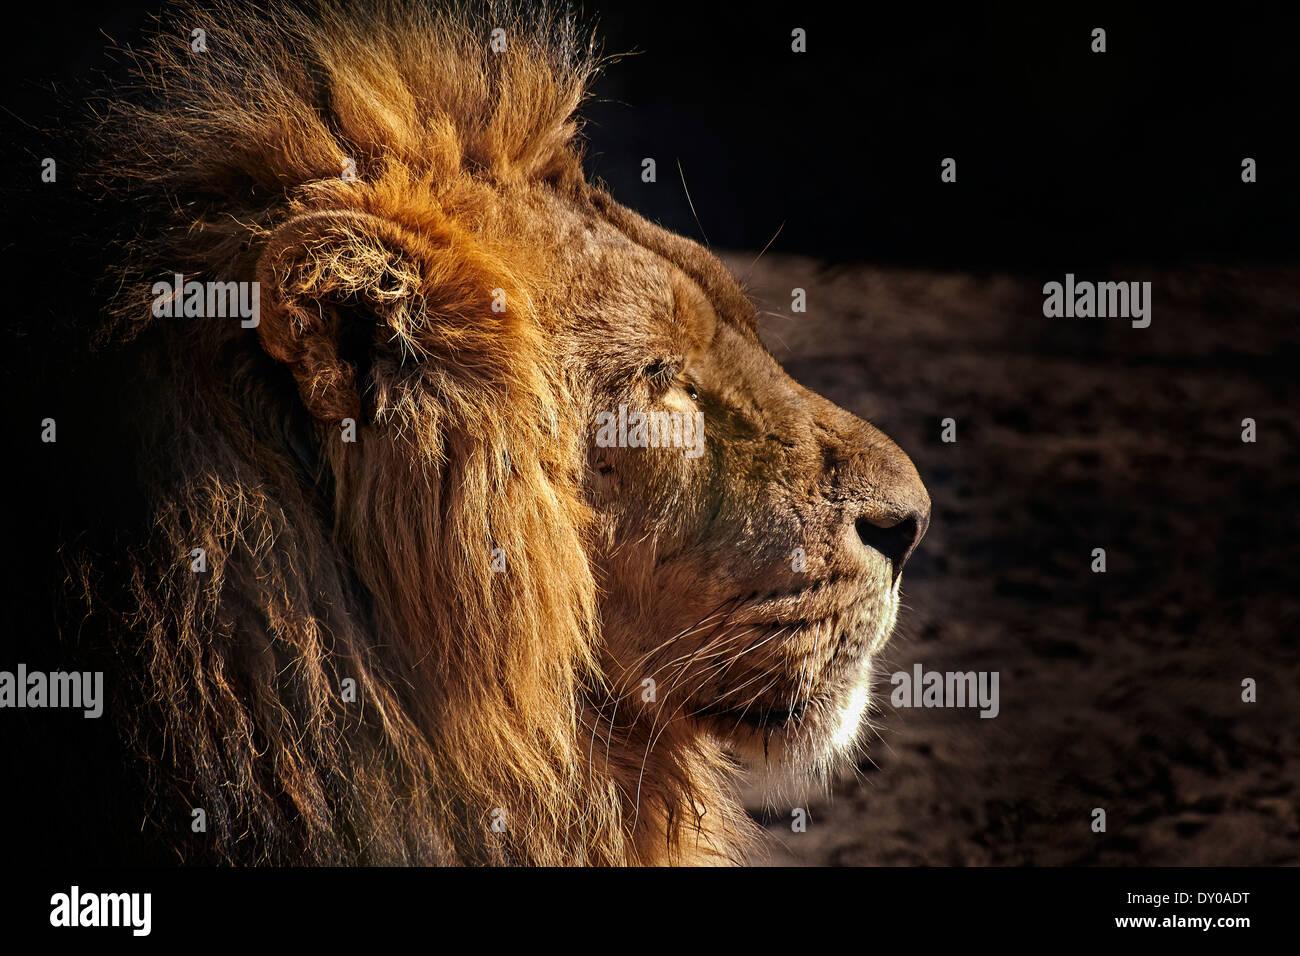 A profile portrait of an adult male Lion Stock Photo